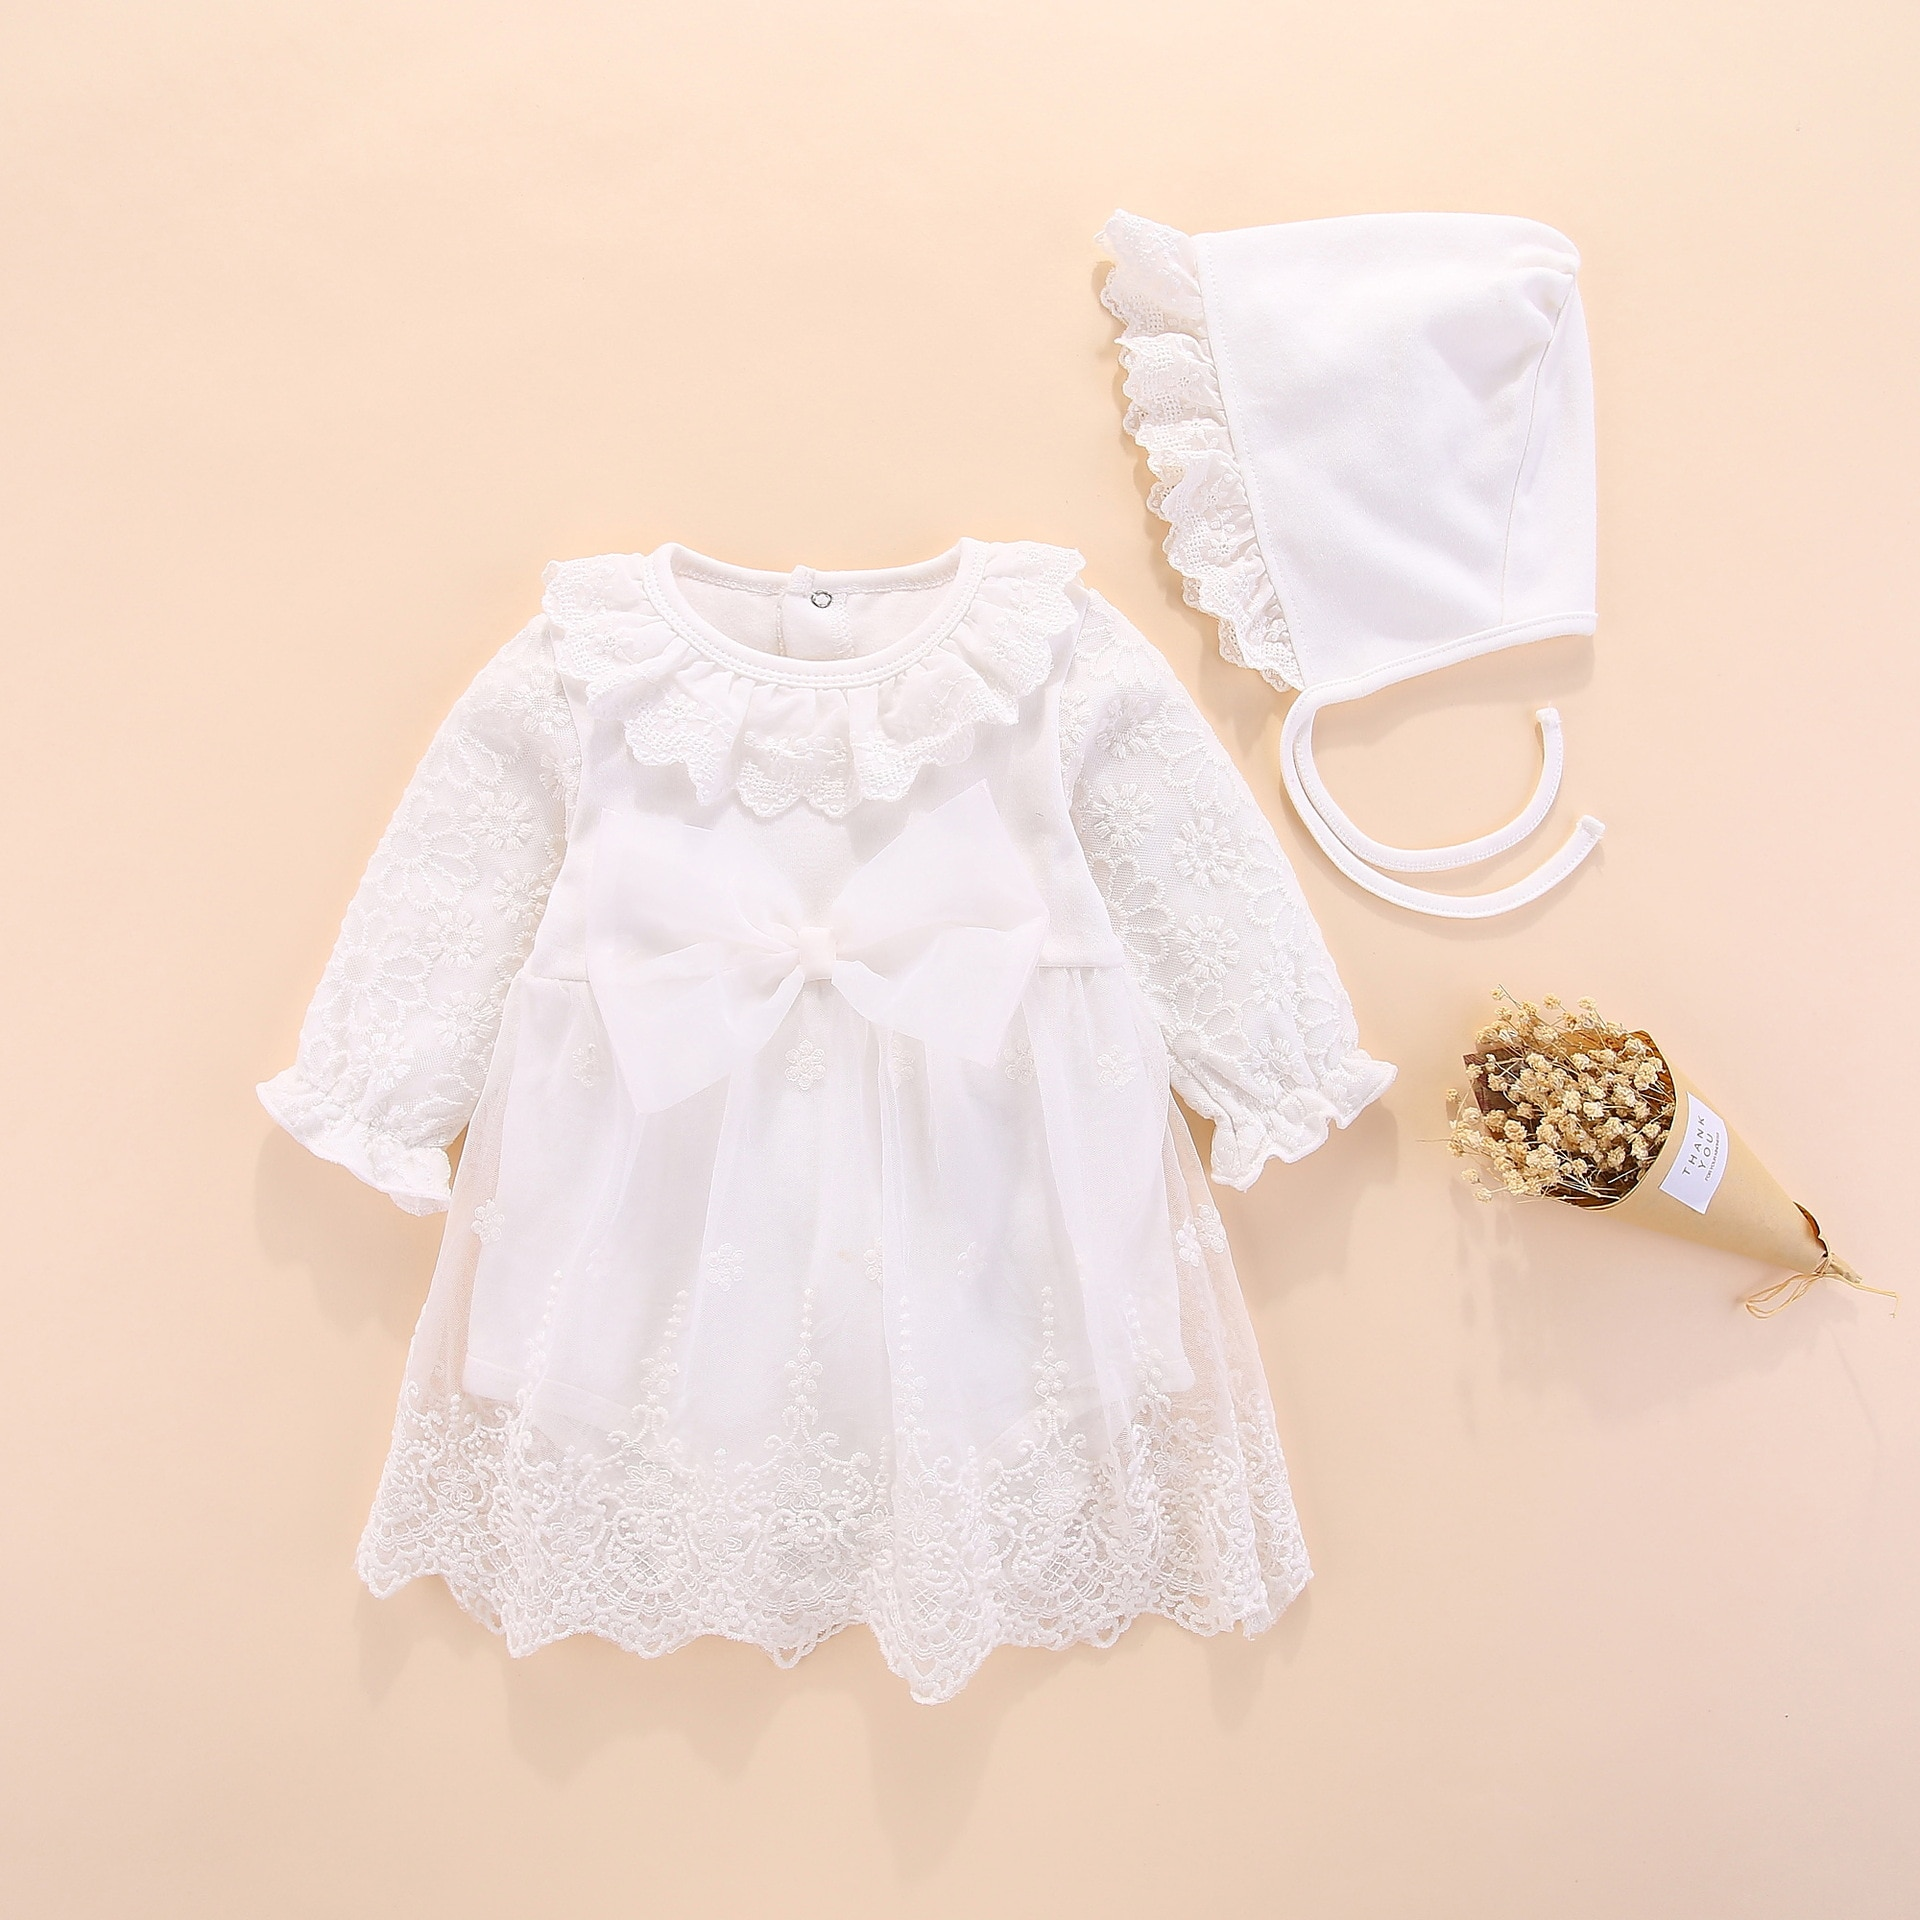 New born baby girl dress 1st Birthday gifts for little girls Princess dress Christening Gown white Baby Girl Baptism Dress